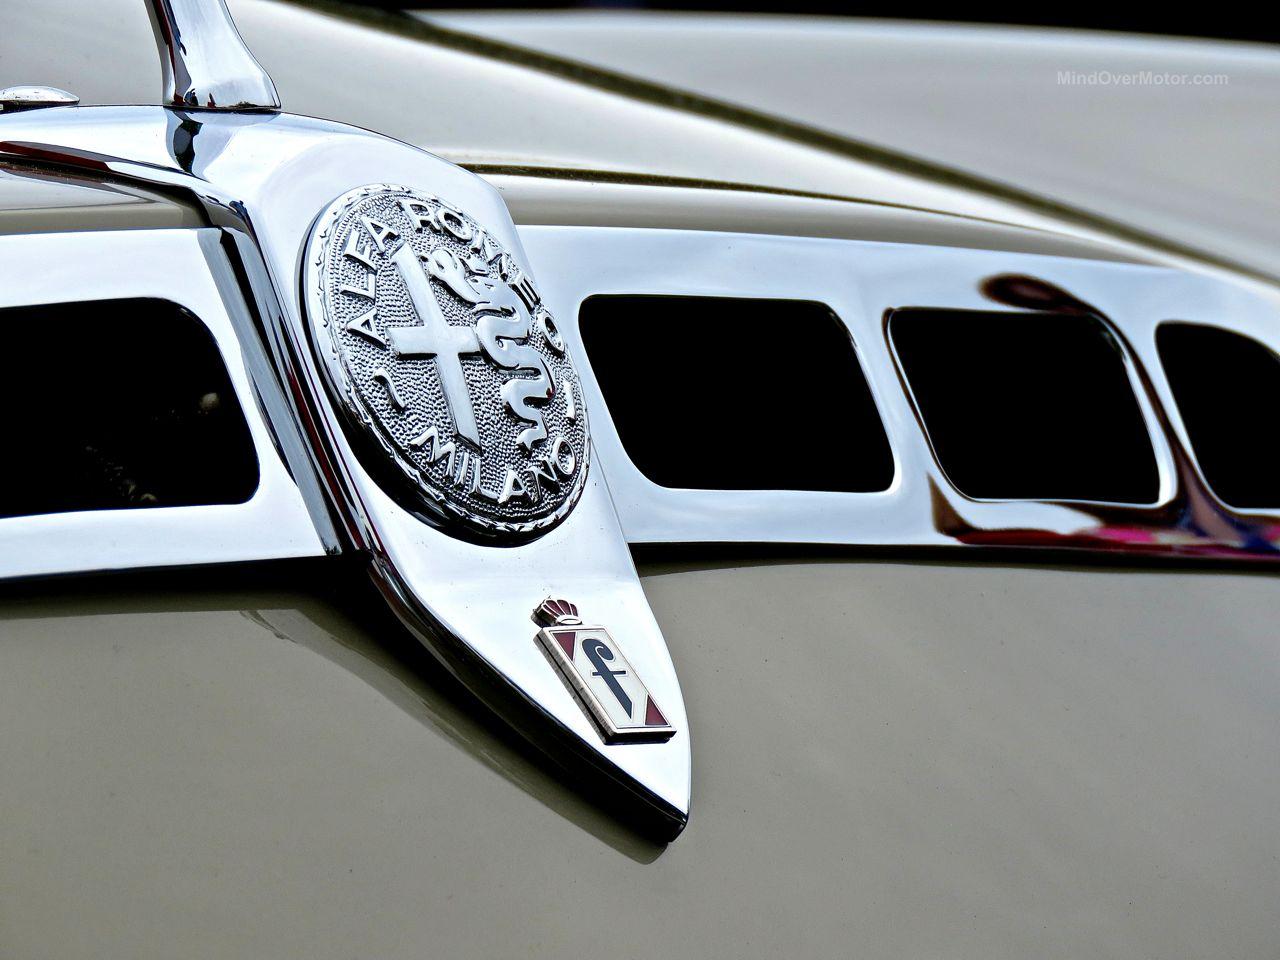 1942 Alfa Romeo 6C 2500 Pininfarina Speciale 1